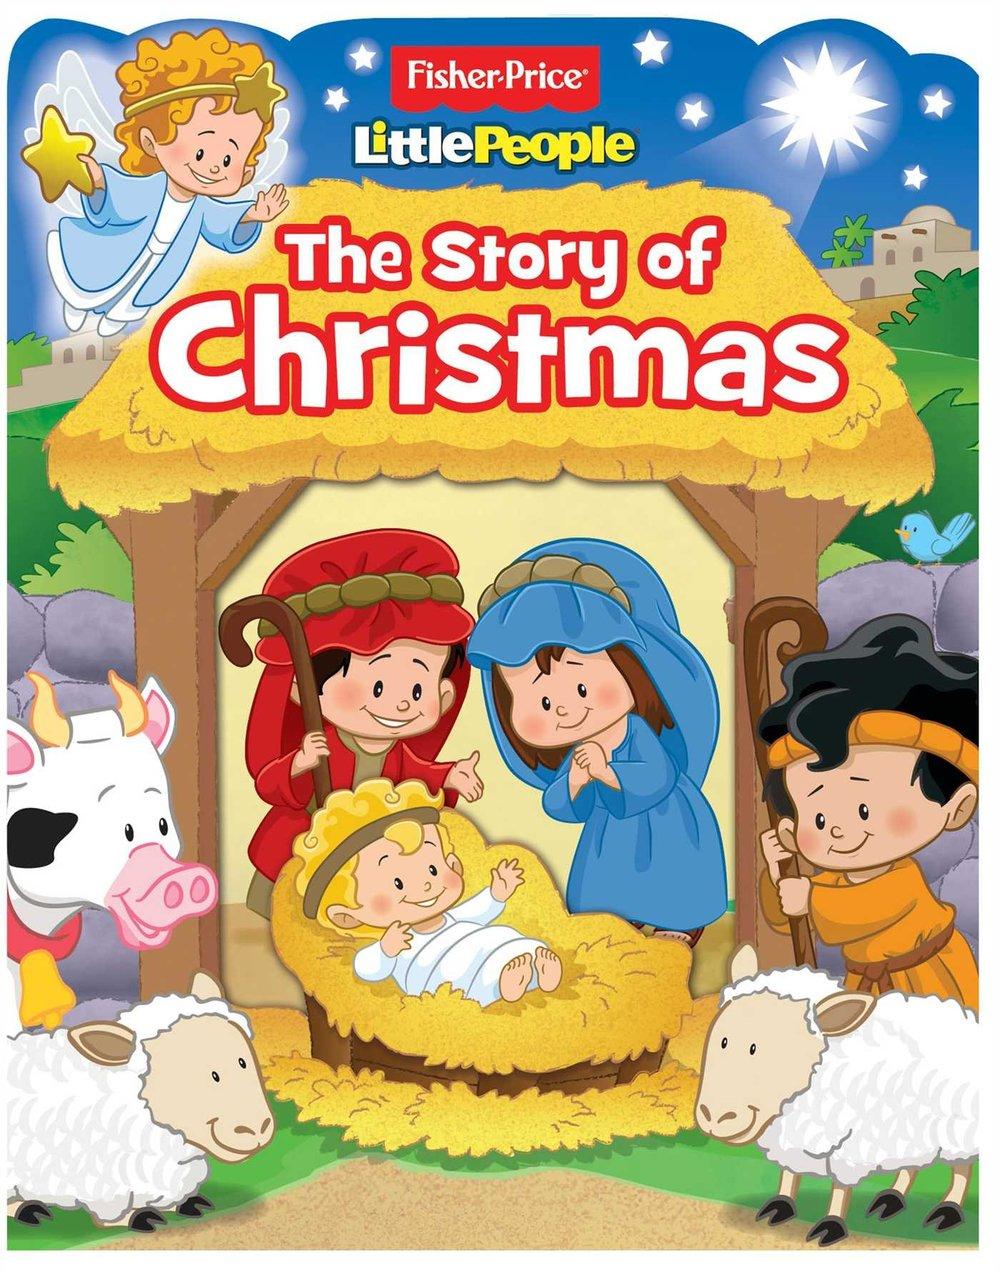 Little People Story of Christmas.jpg